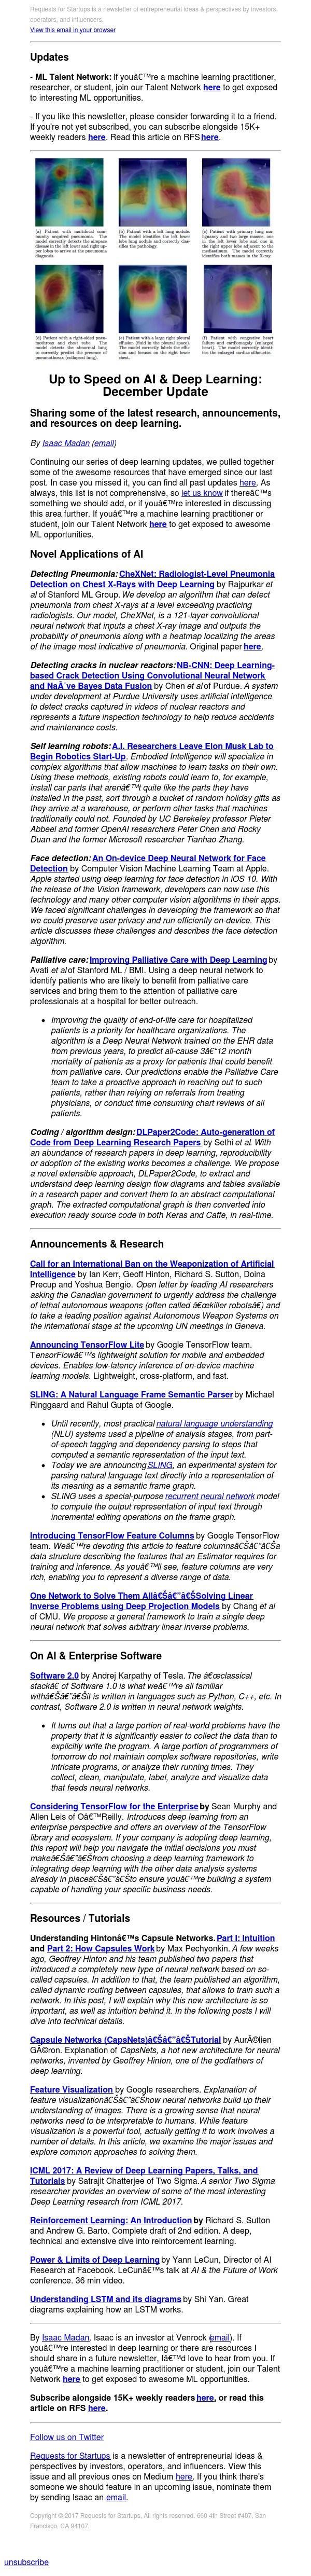 RFS #81: AI & Deep Learning December Update